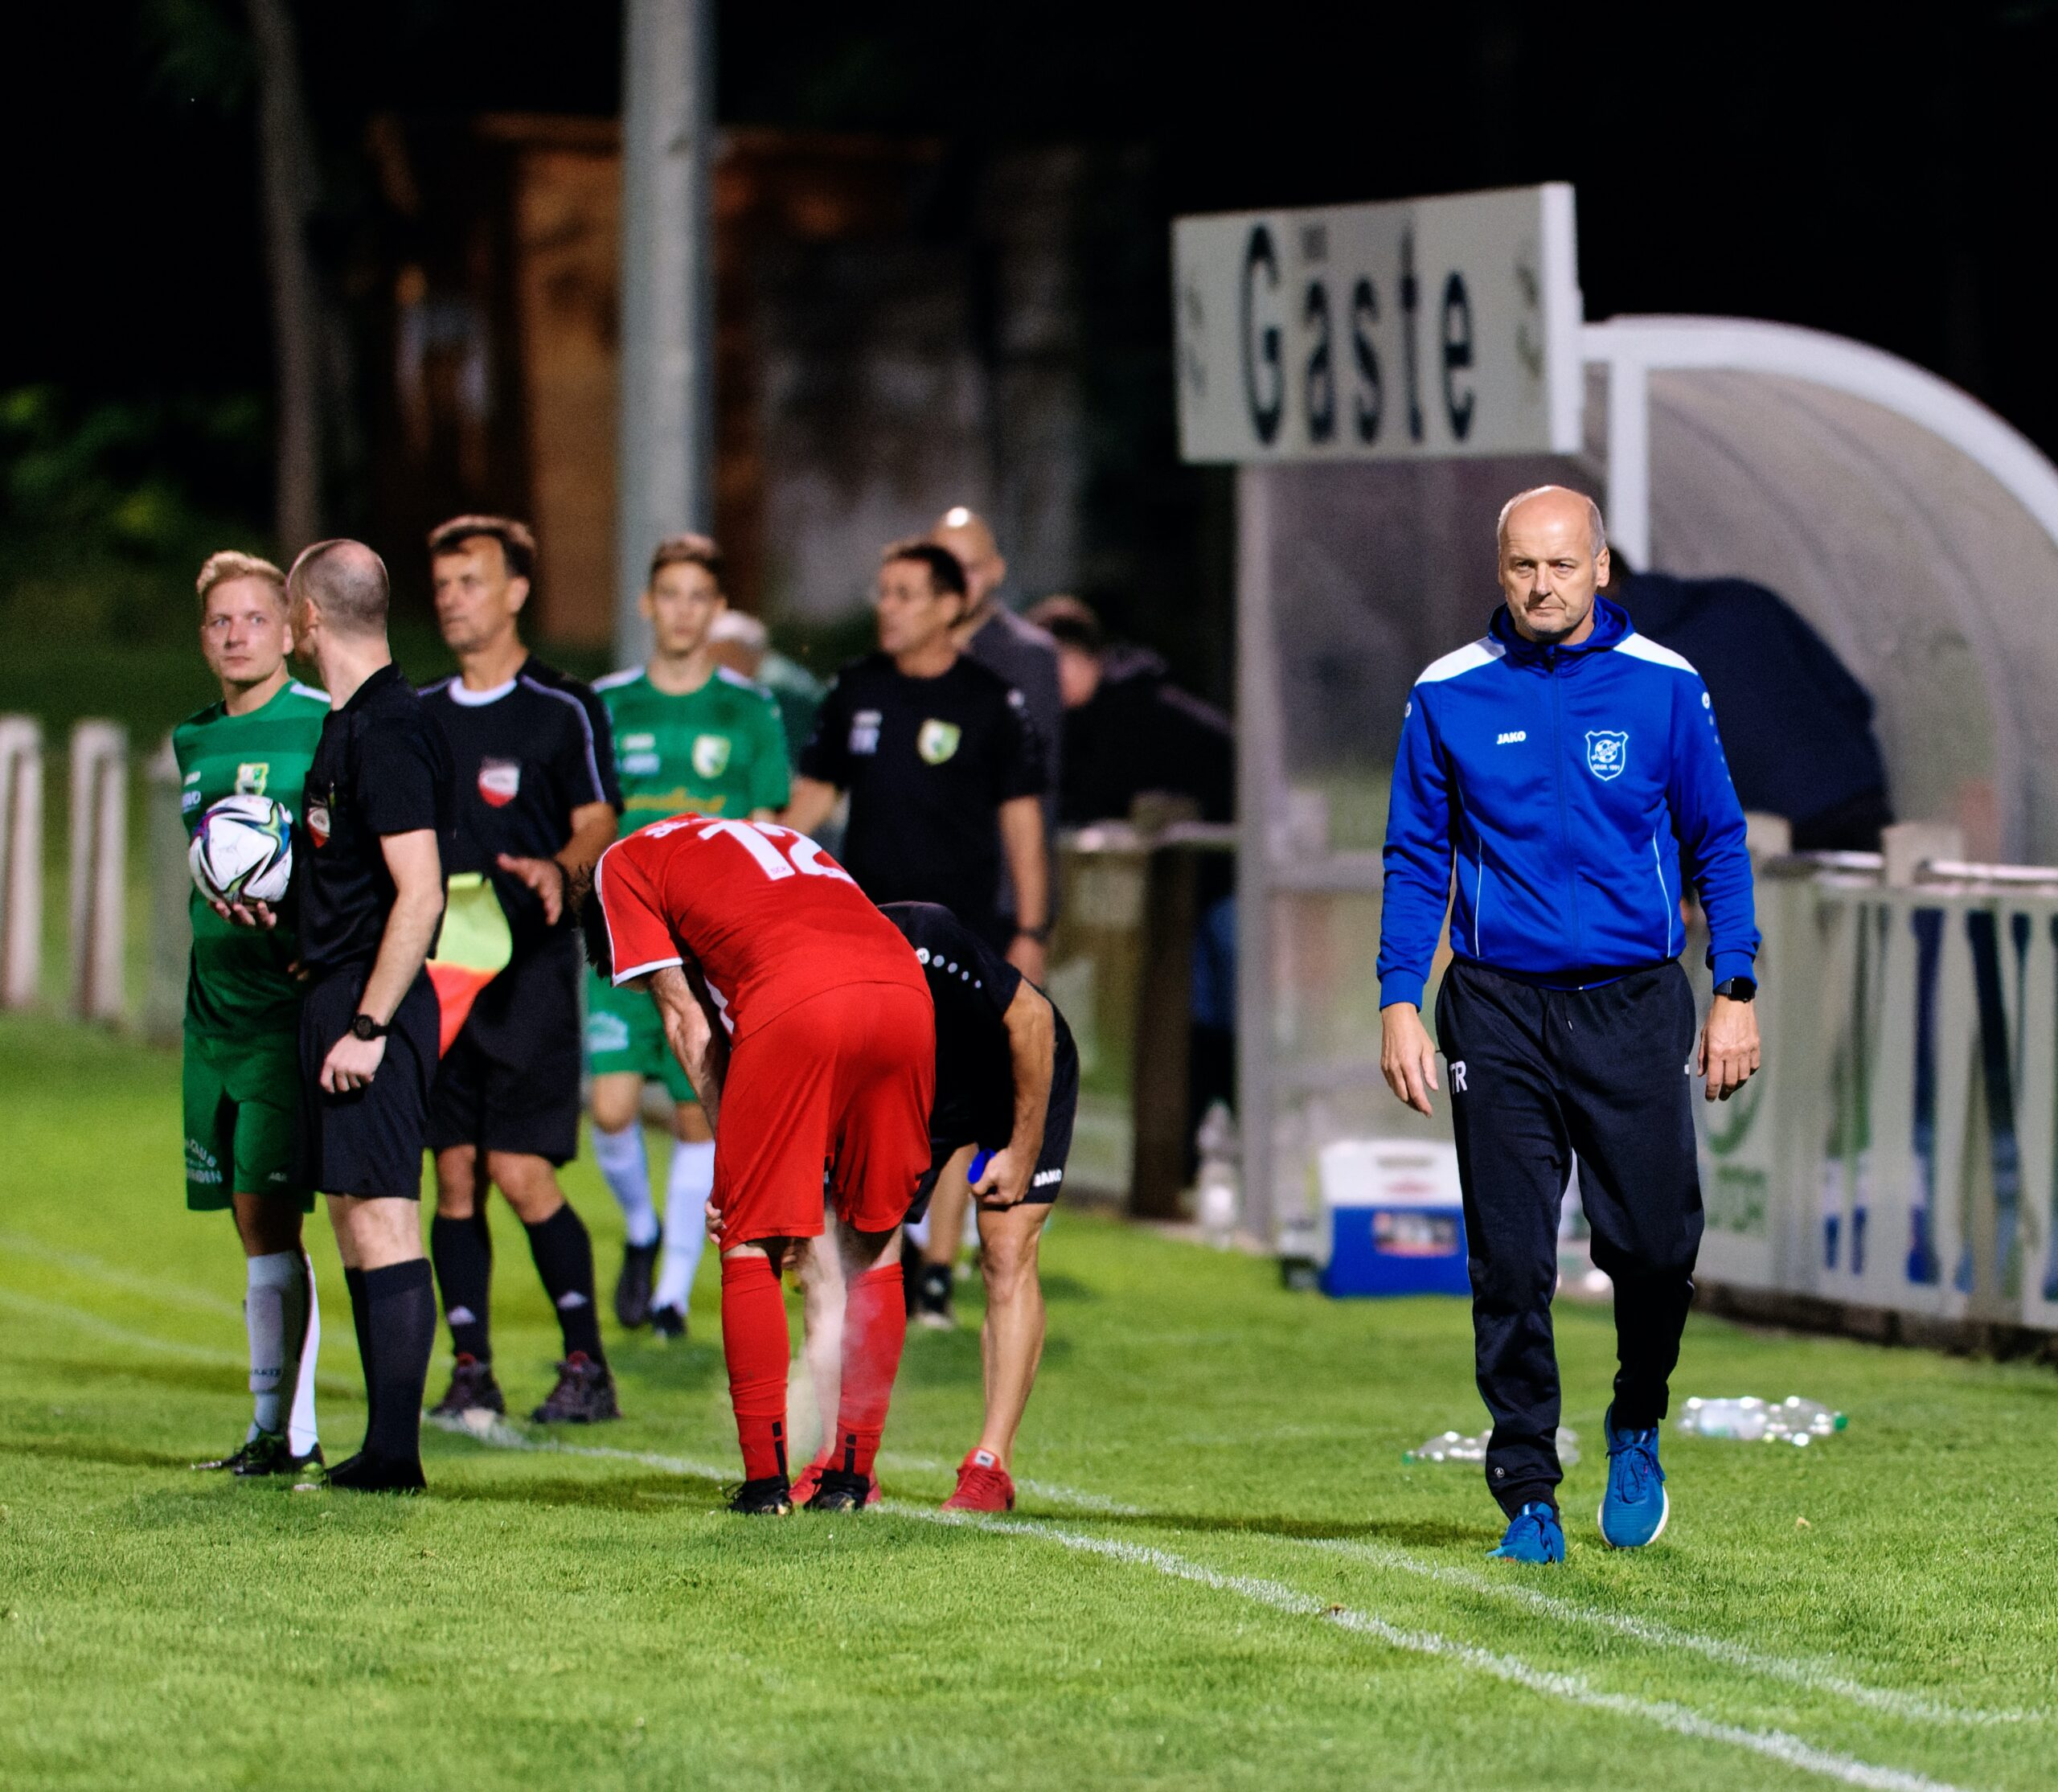 Erwin Raihofer considers substitution